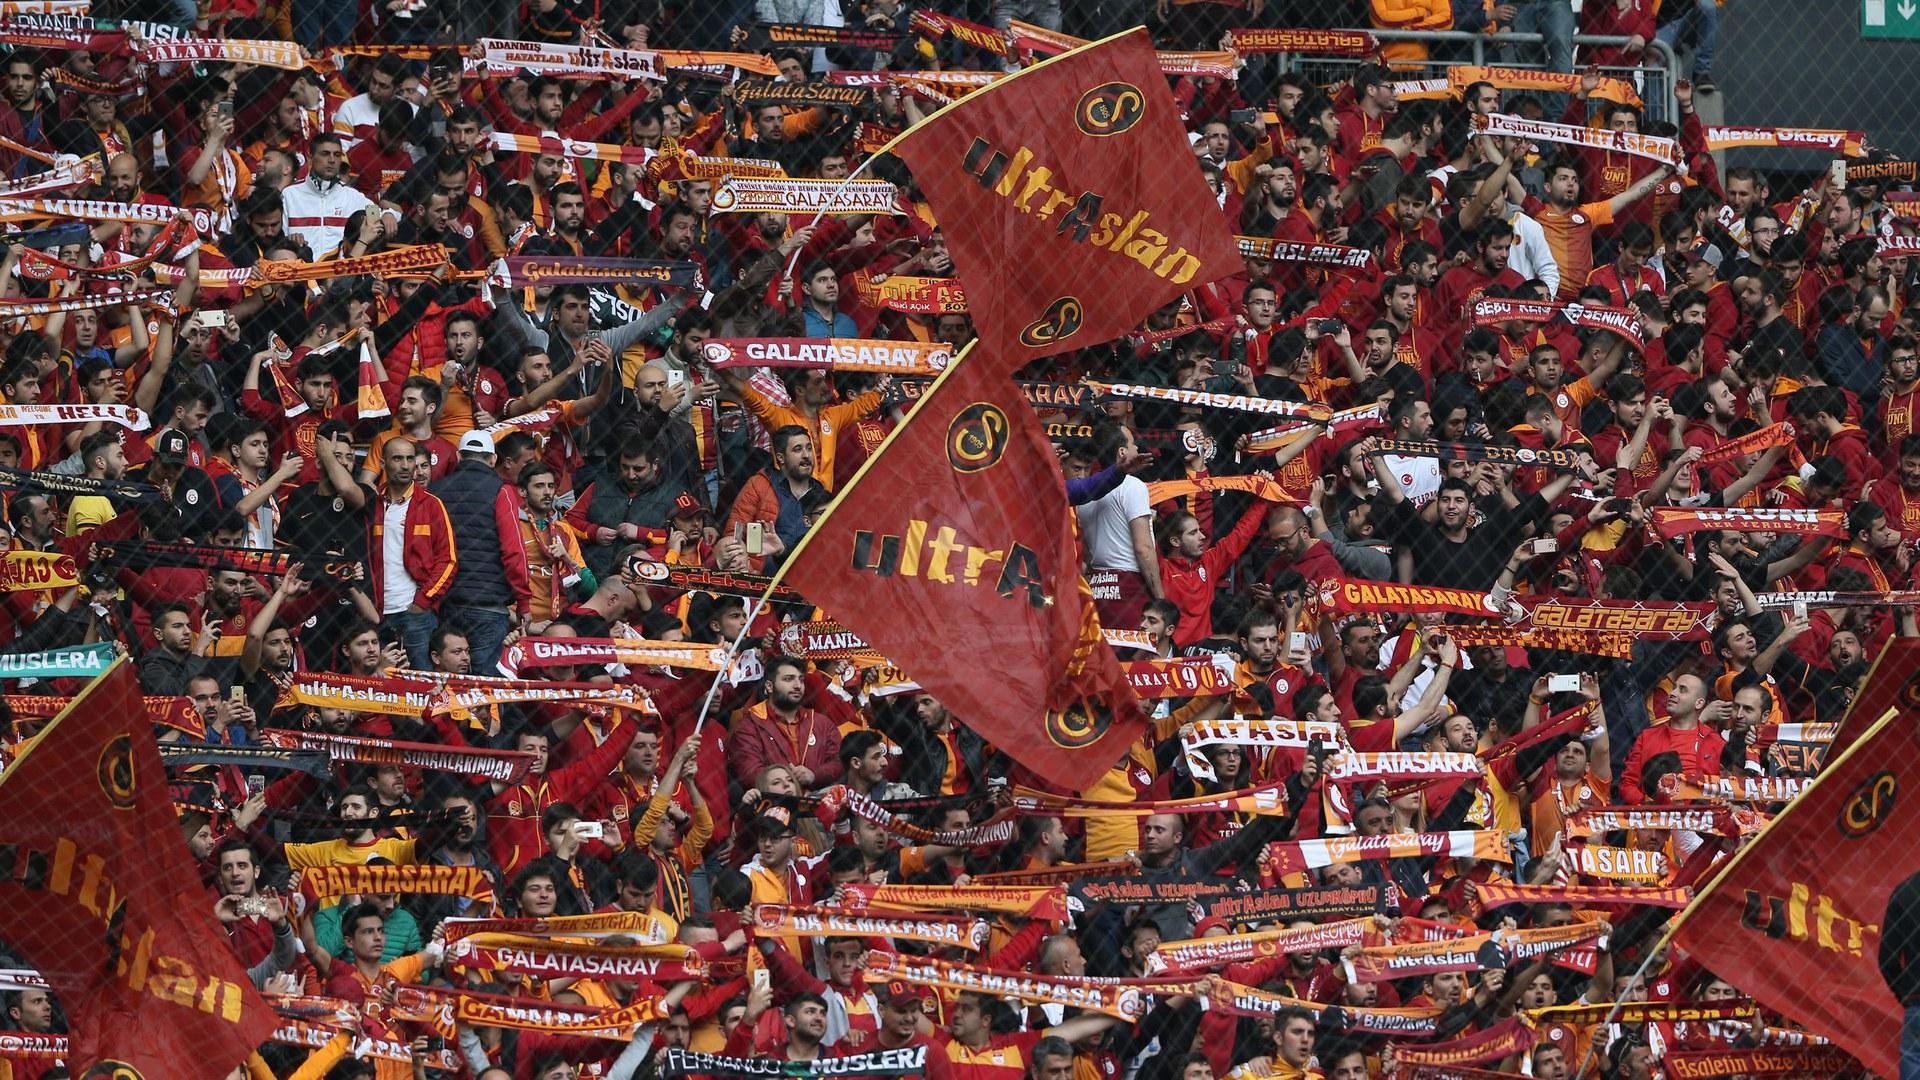 Galatasaray Fenerbahce Galatasaray fans STSL 04232017